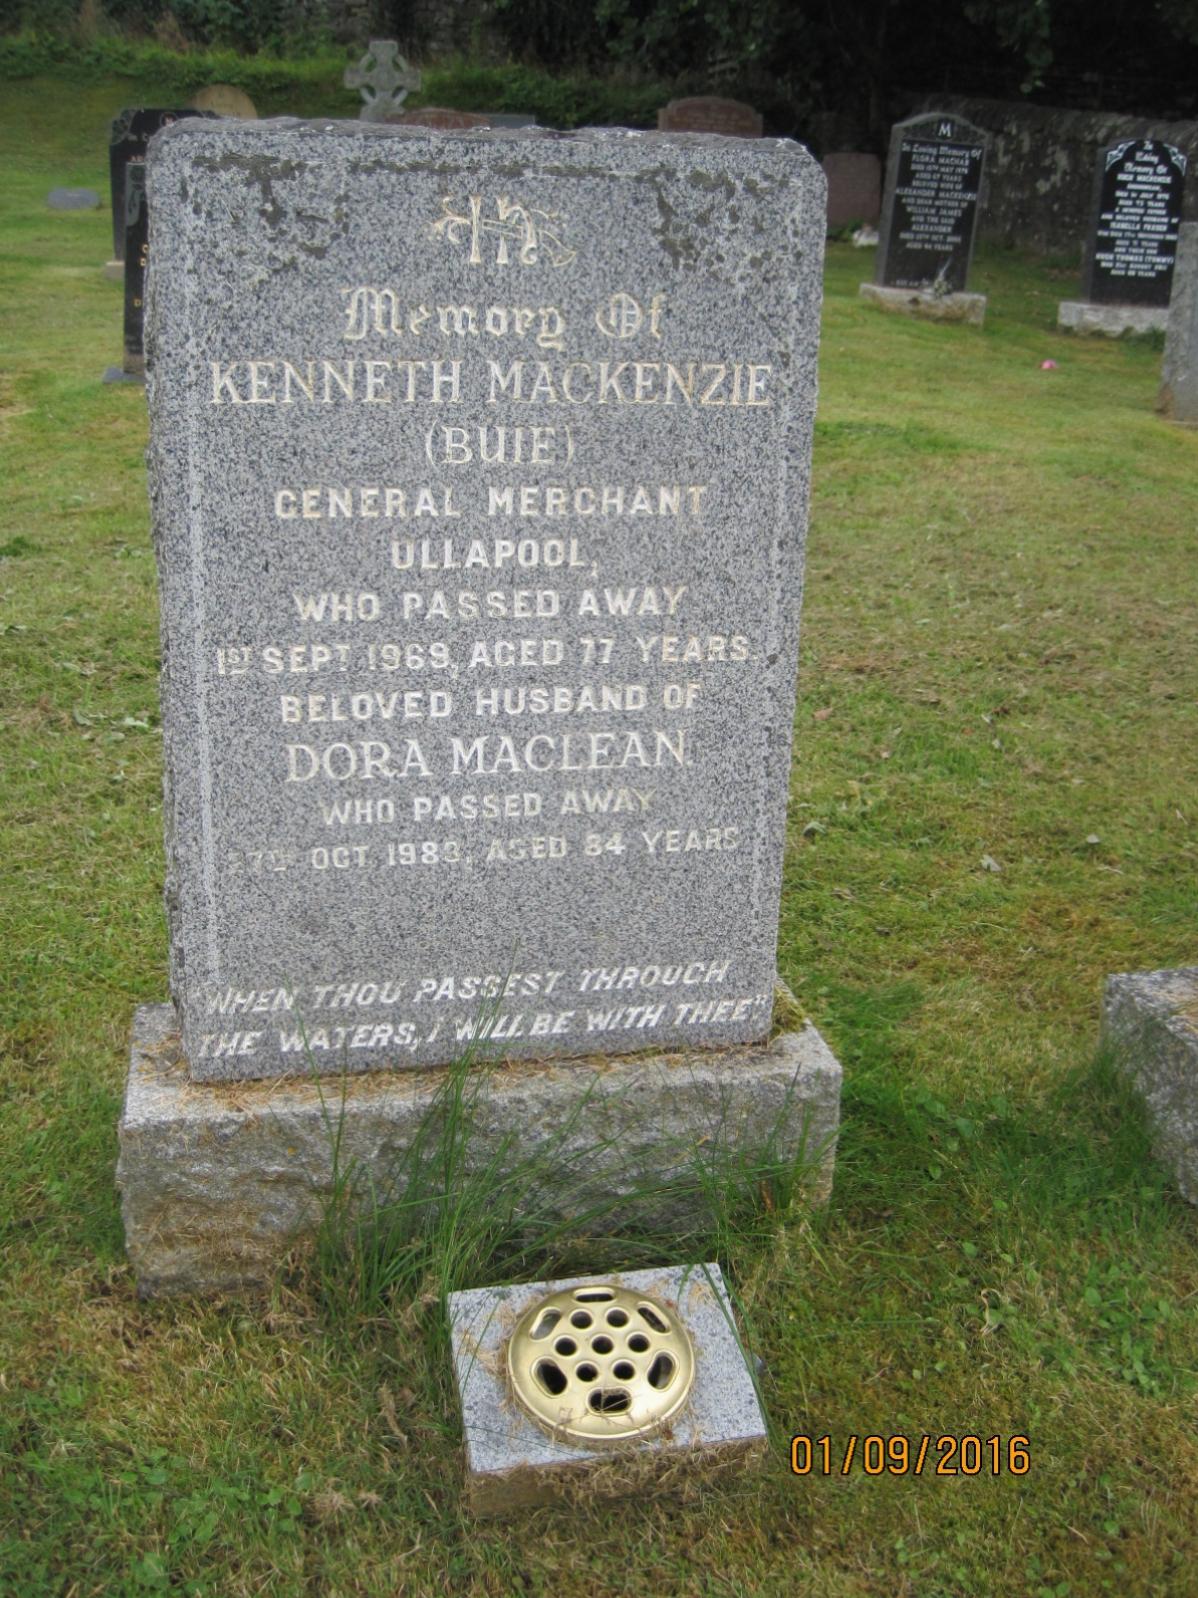 Kenneth Mackenzie 1969